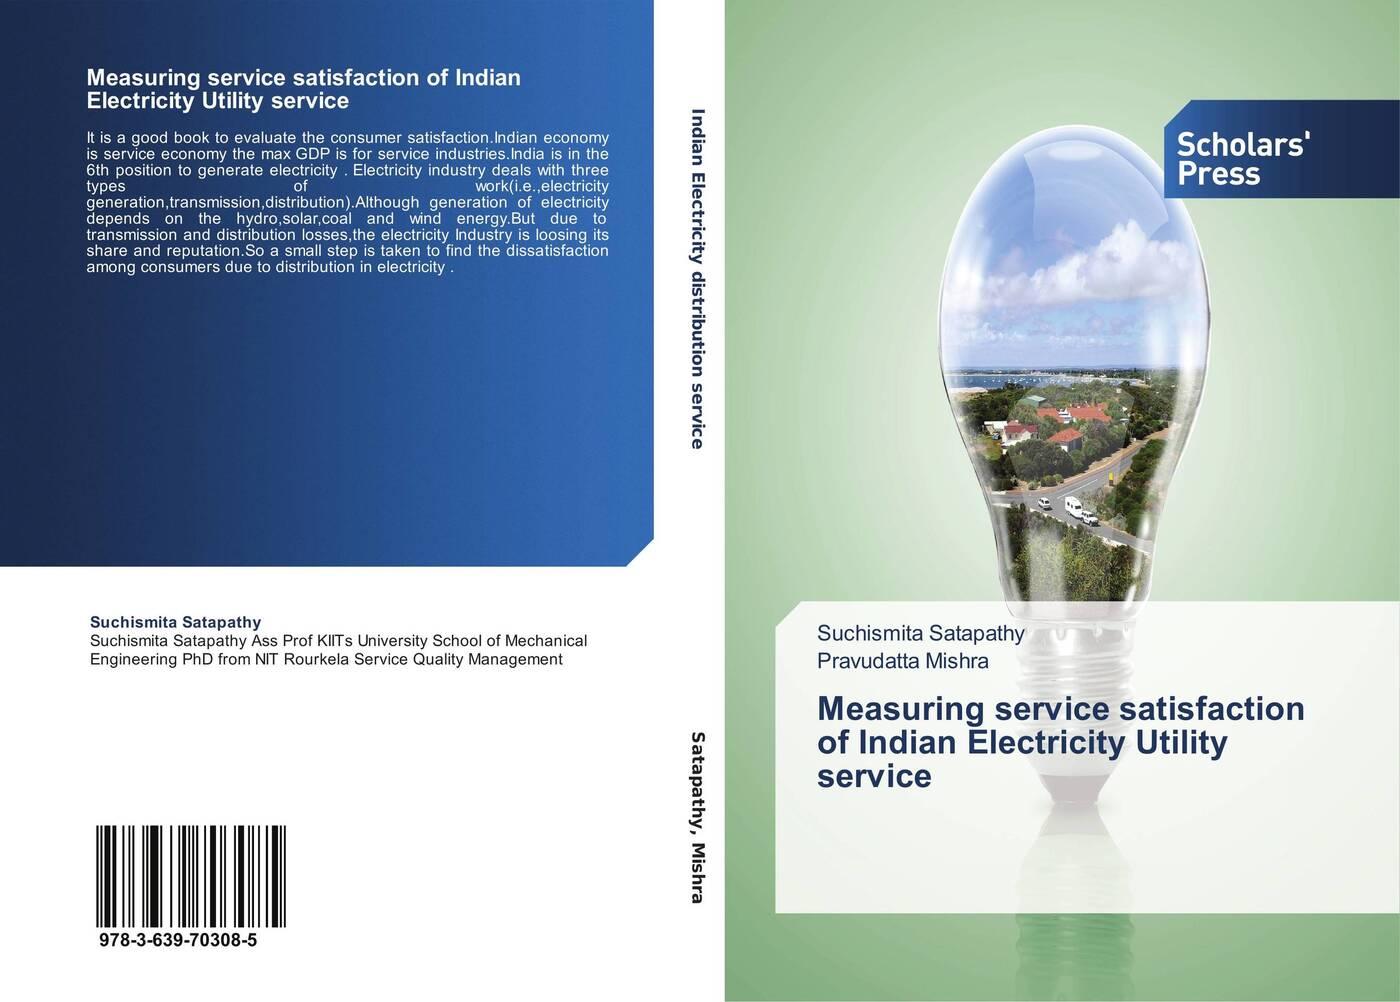 Suchismita Satapathy and Pravudatta Mishra Measuring service satisfaction of Indian Electricity Utility service the step of the step of the piezoelectric generator is to generate electricity